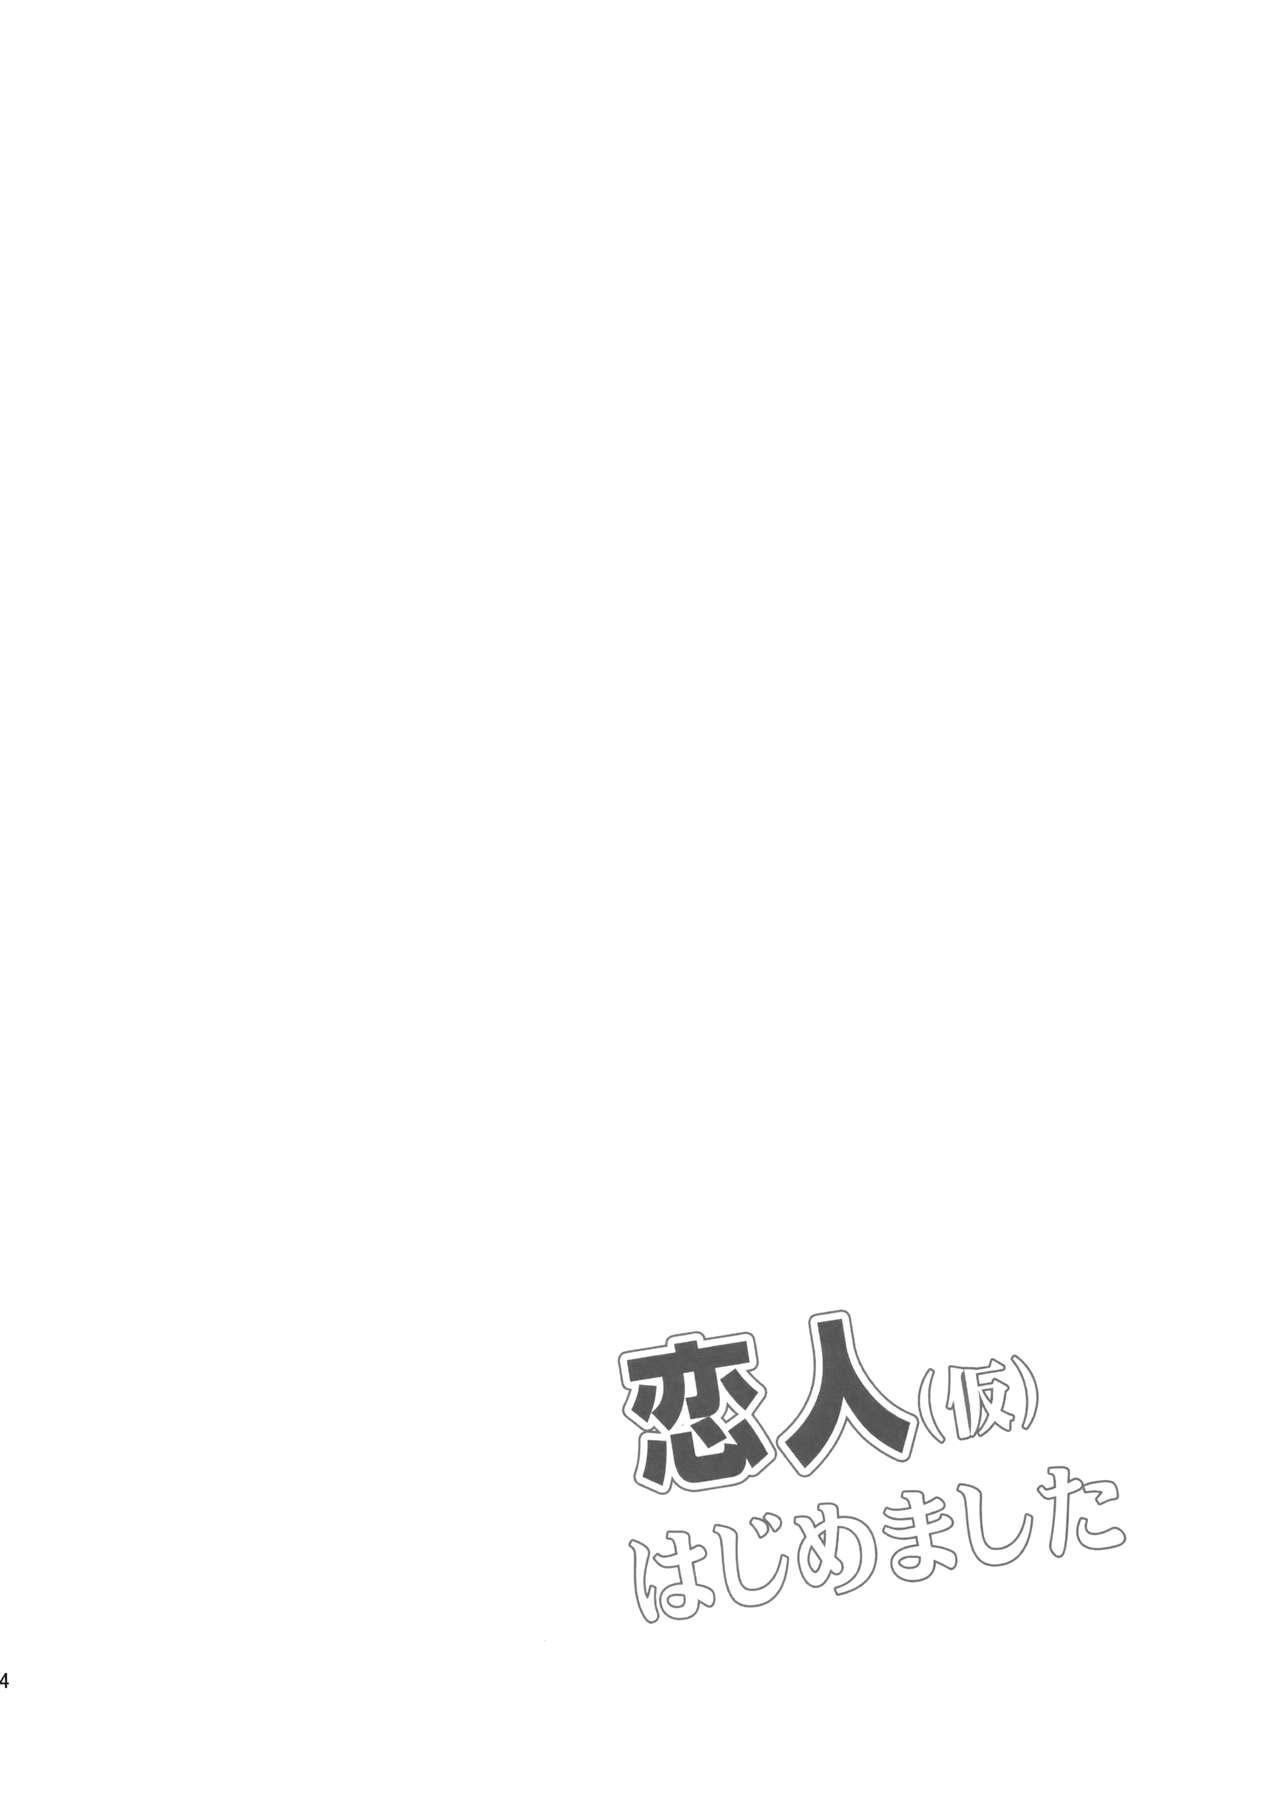 (C91) [Garimpeiro (Mame Denkyuu)] Koibito (kari) Hajimemashita | Becoming lovers (temp) (THE IDOLM@STER CINDERELLA GIRLS) [English] [L-san] 2